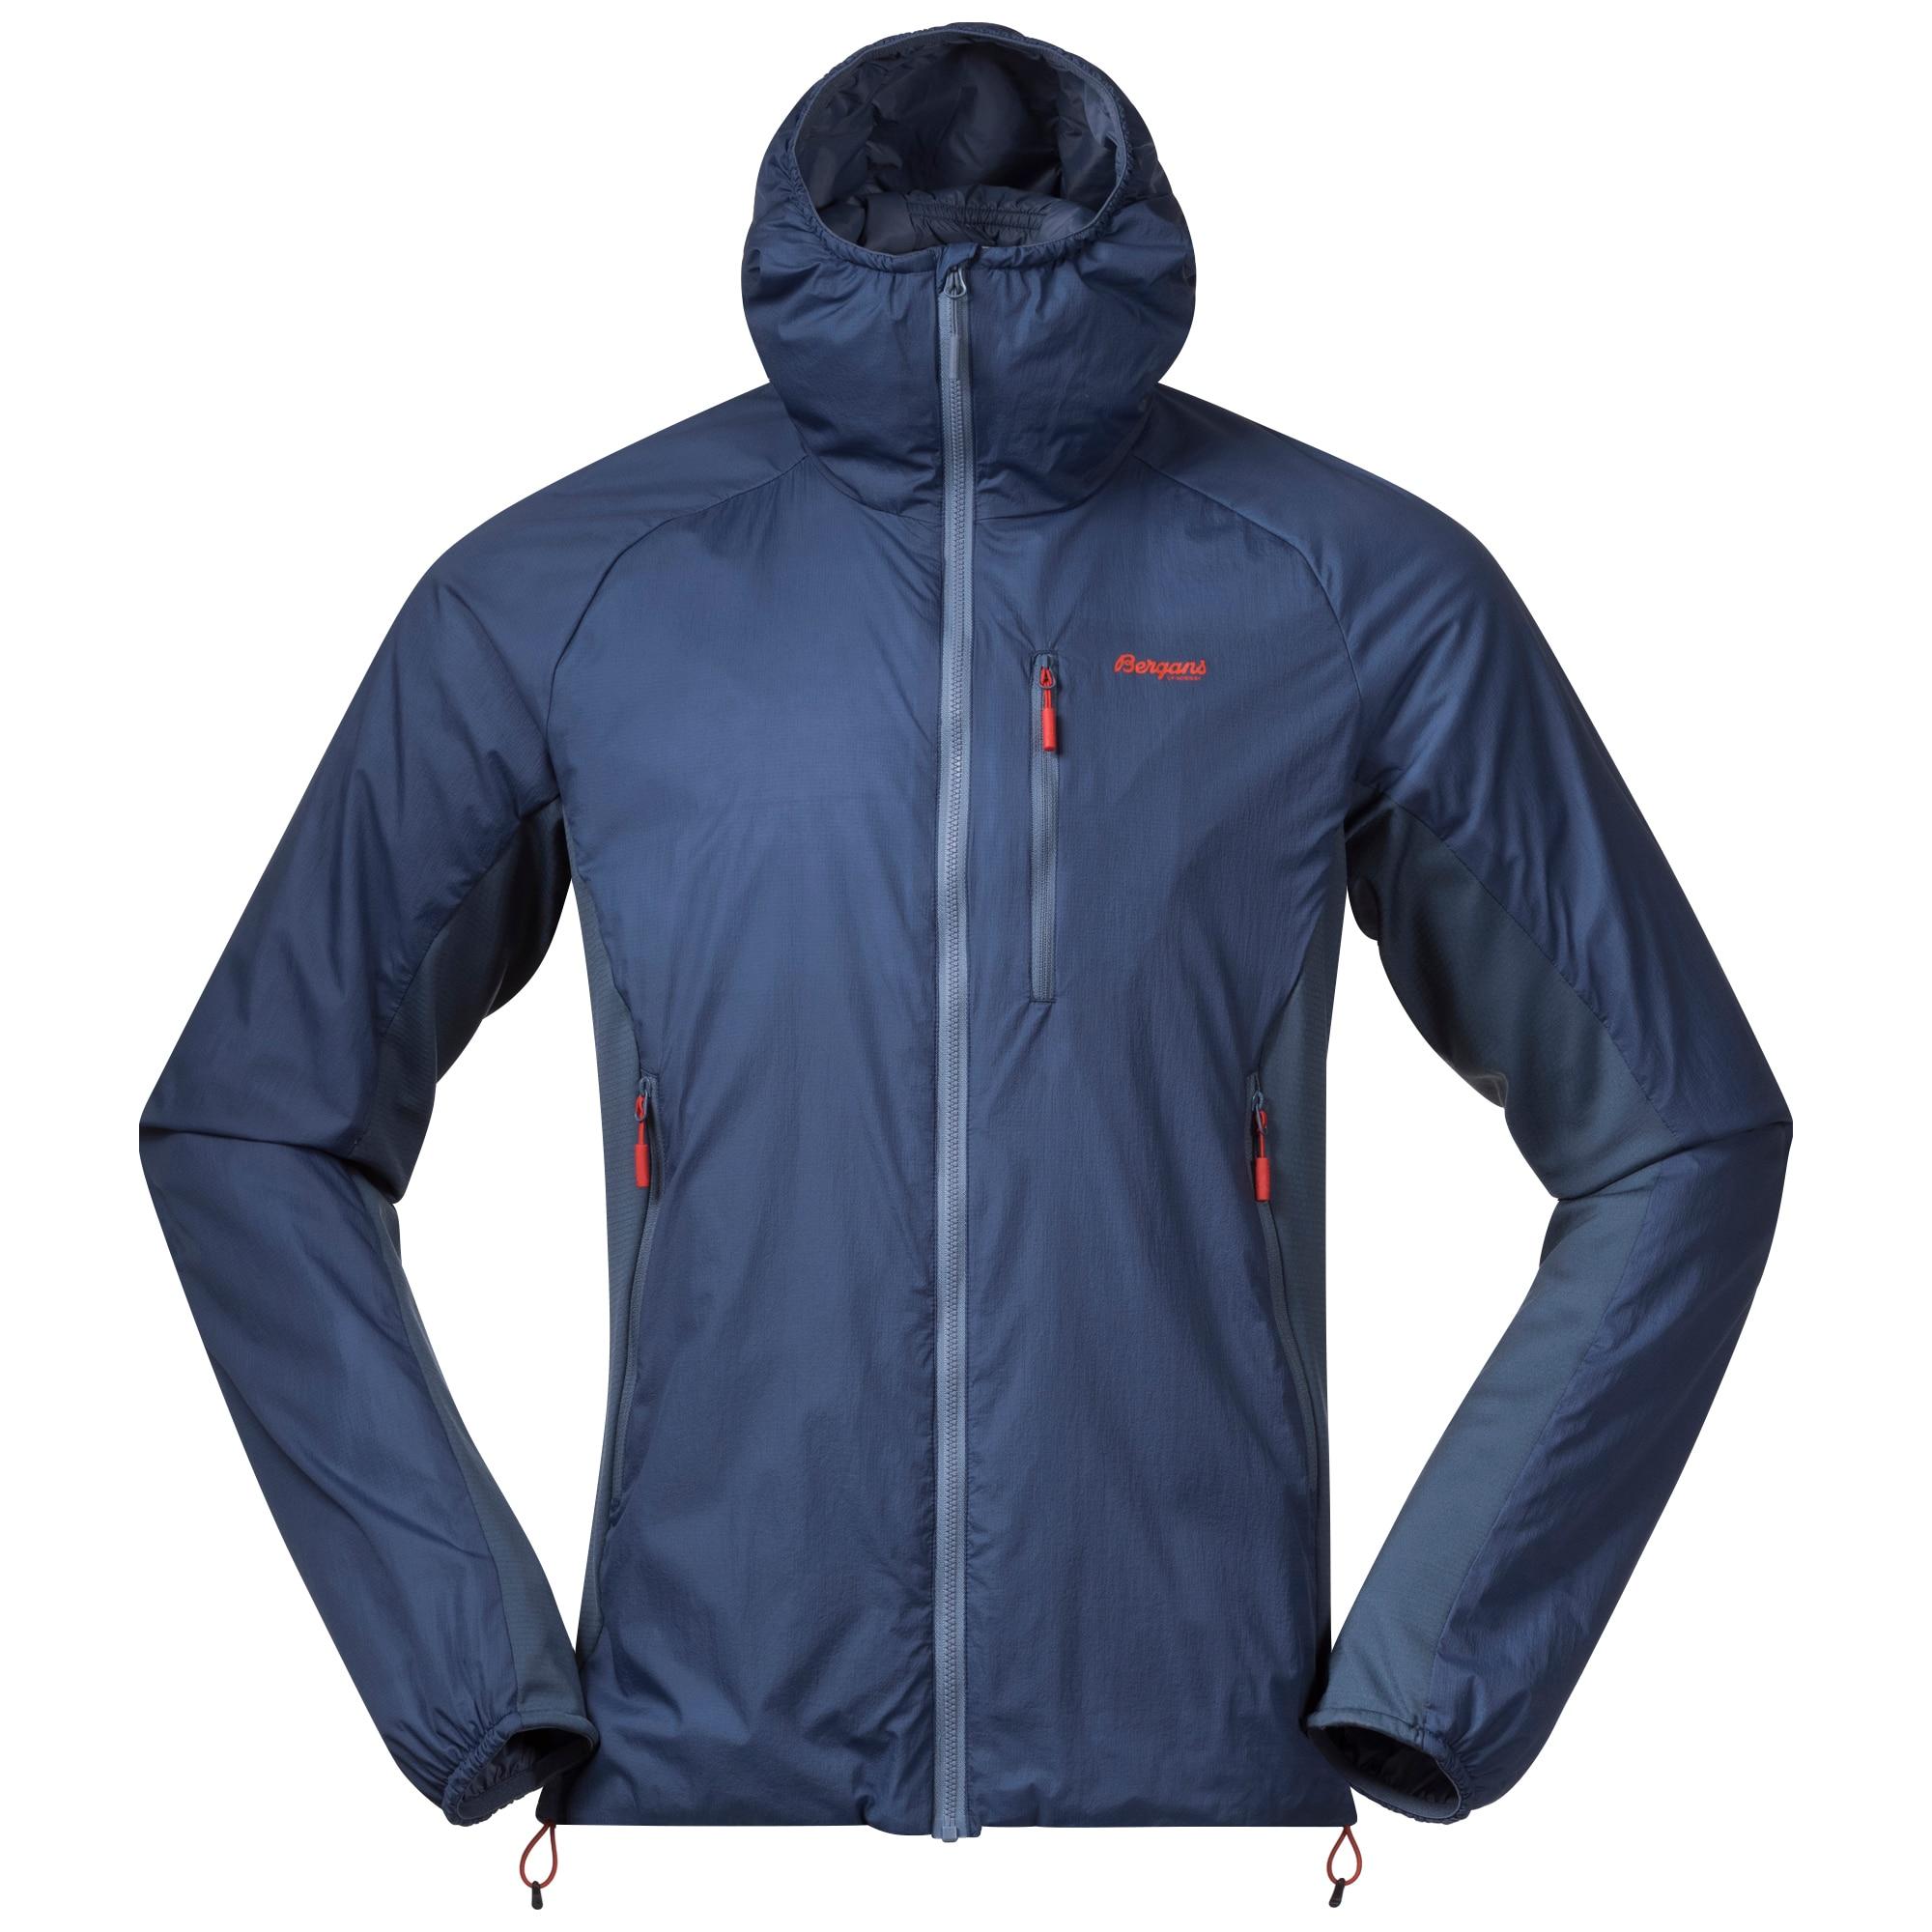 Romsdal Light Insulated Jacket